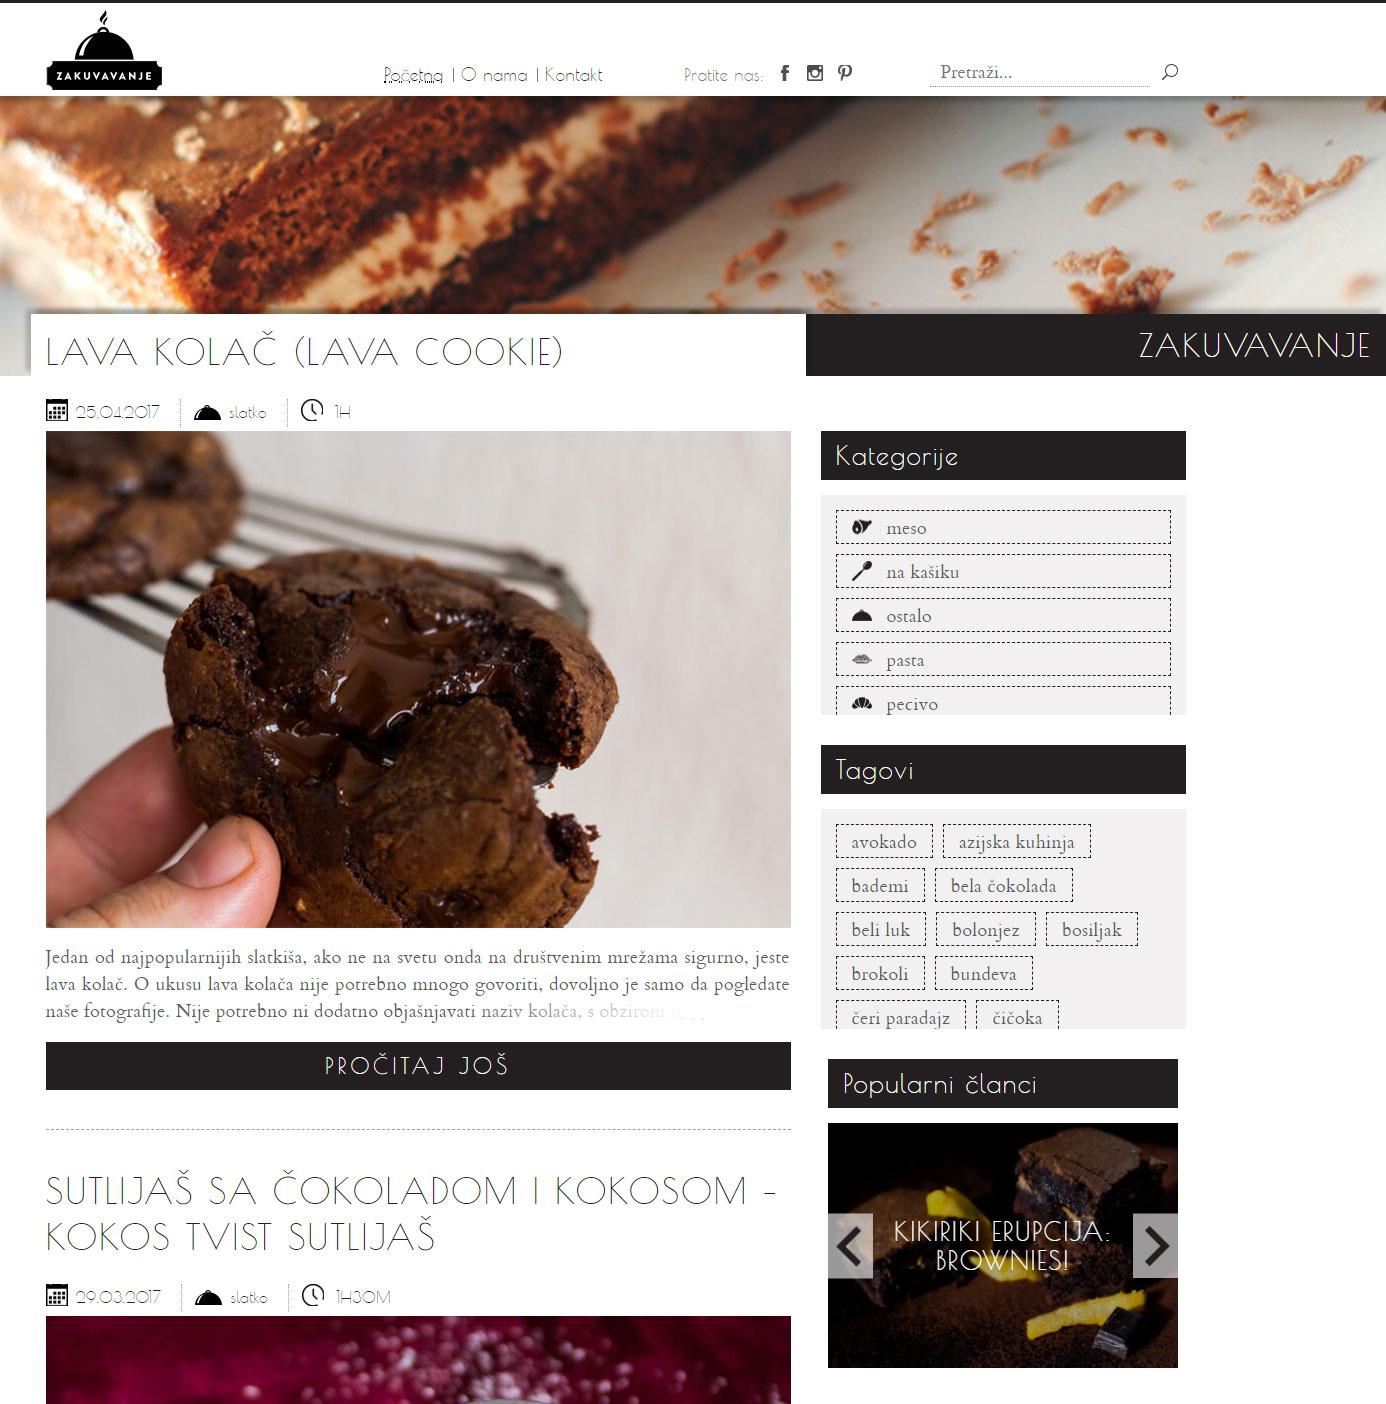 Webredone web design & development - Zakuvavanje website wordpress blog homepage image